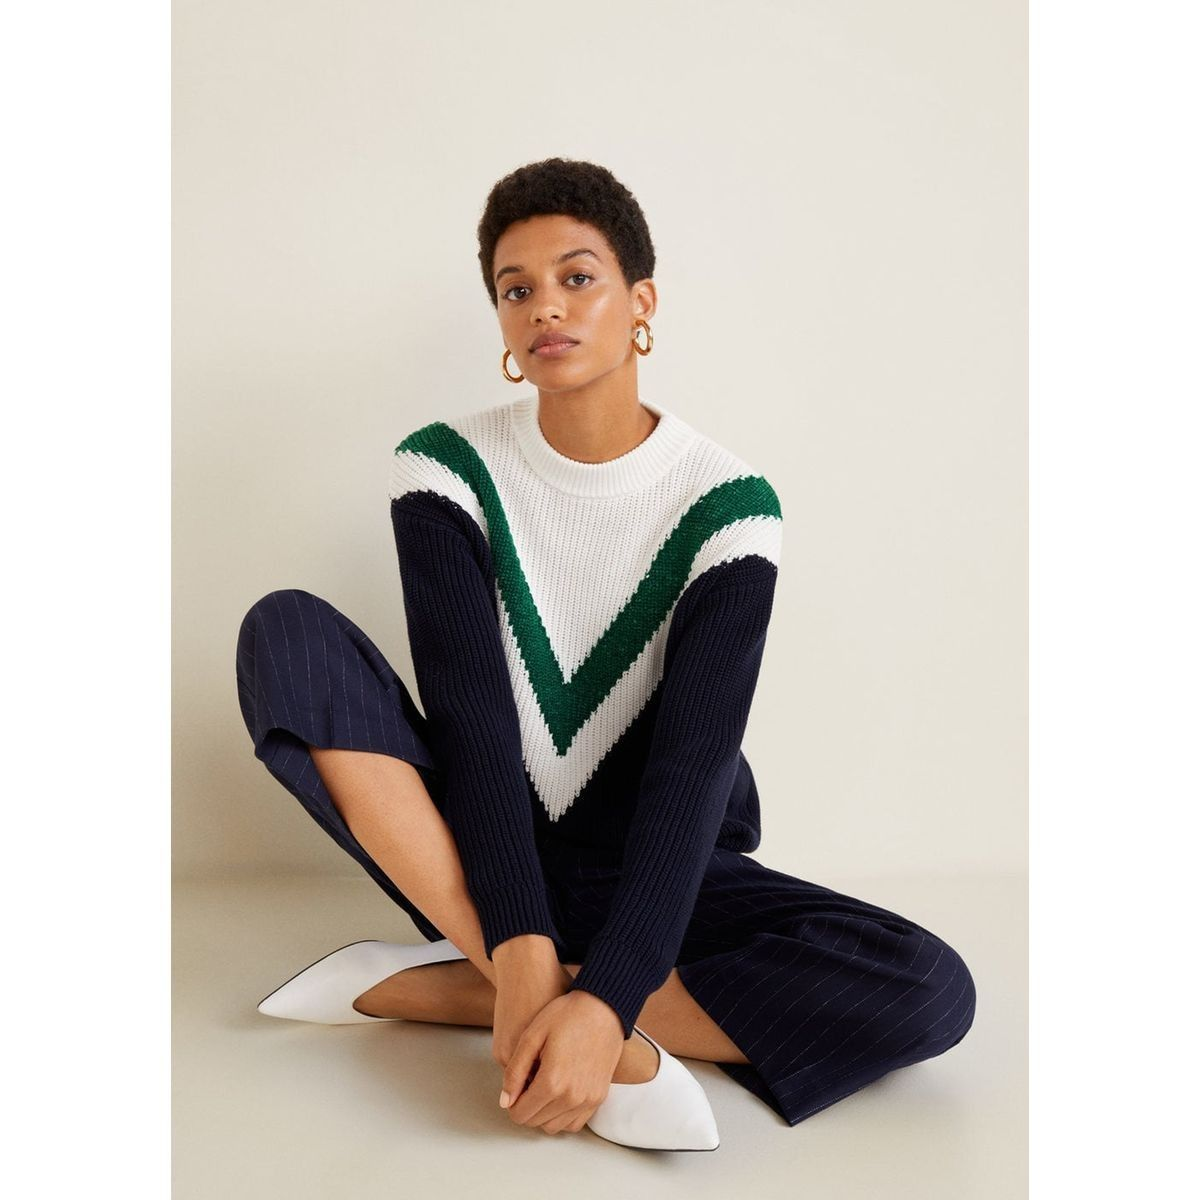 7393389b9e48 Products Cotton Taille Tricolore Pull Coton Over 42 38 36 ww0zX